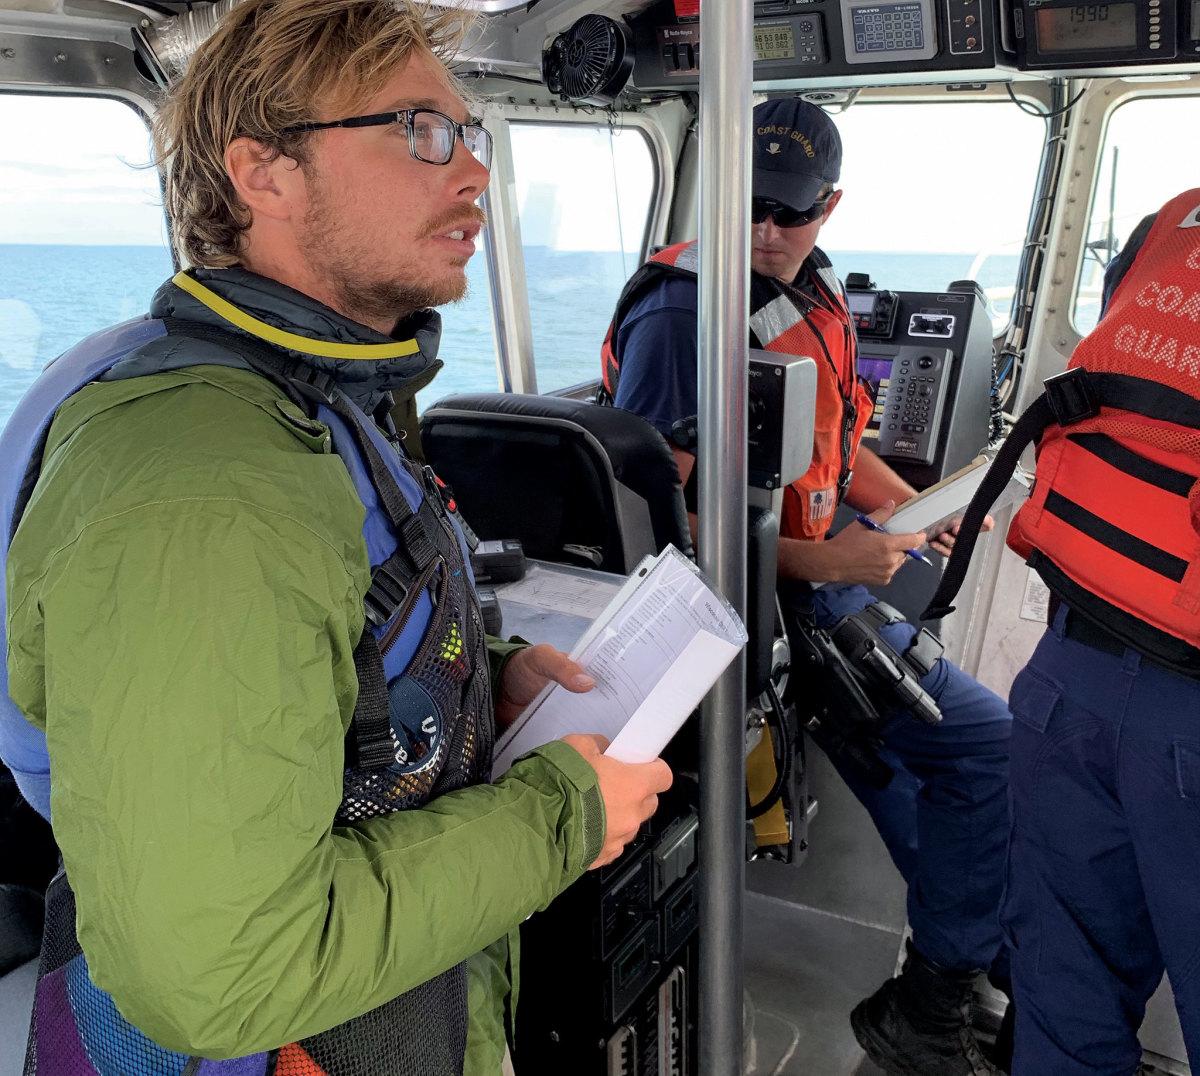 The author in hot pursuit of his lost catamaran